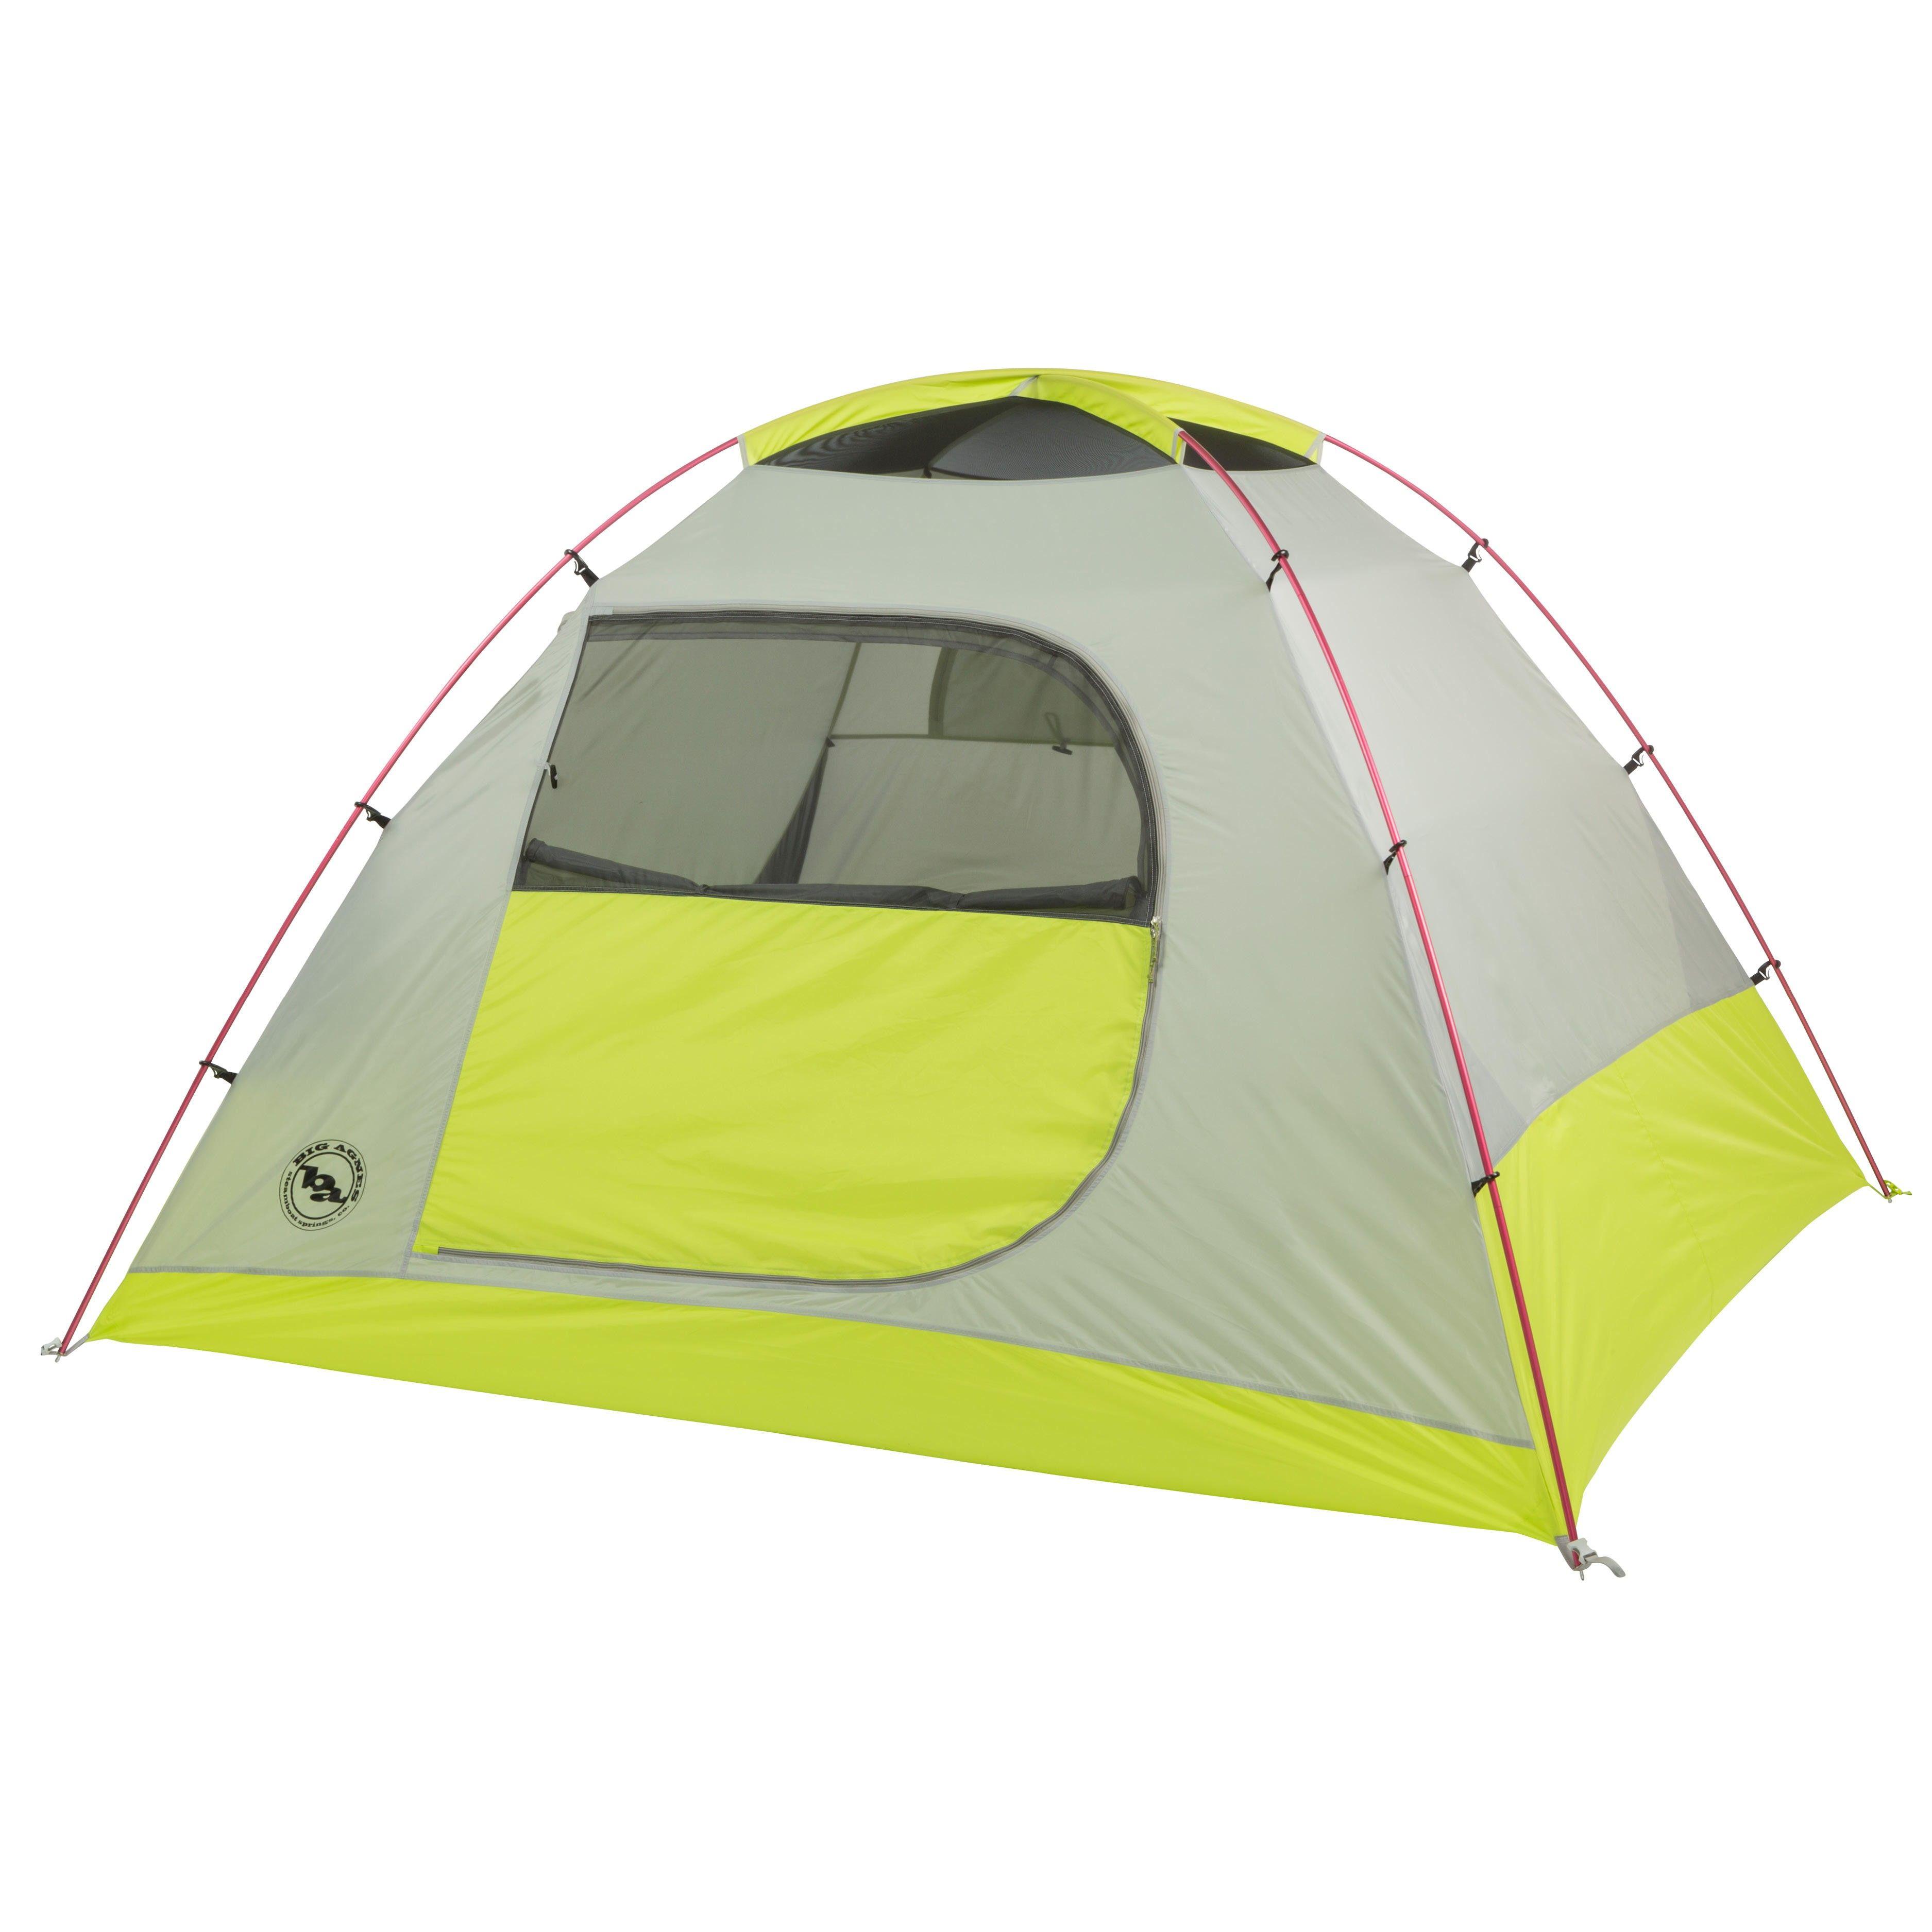 Door top flap open | Tent, 6 person tent, Festival camping